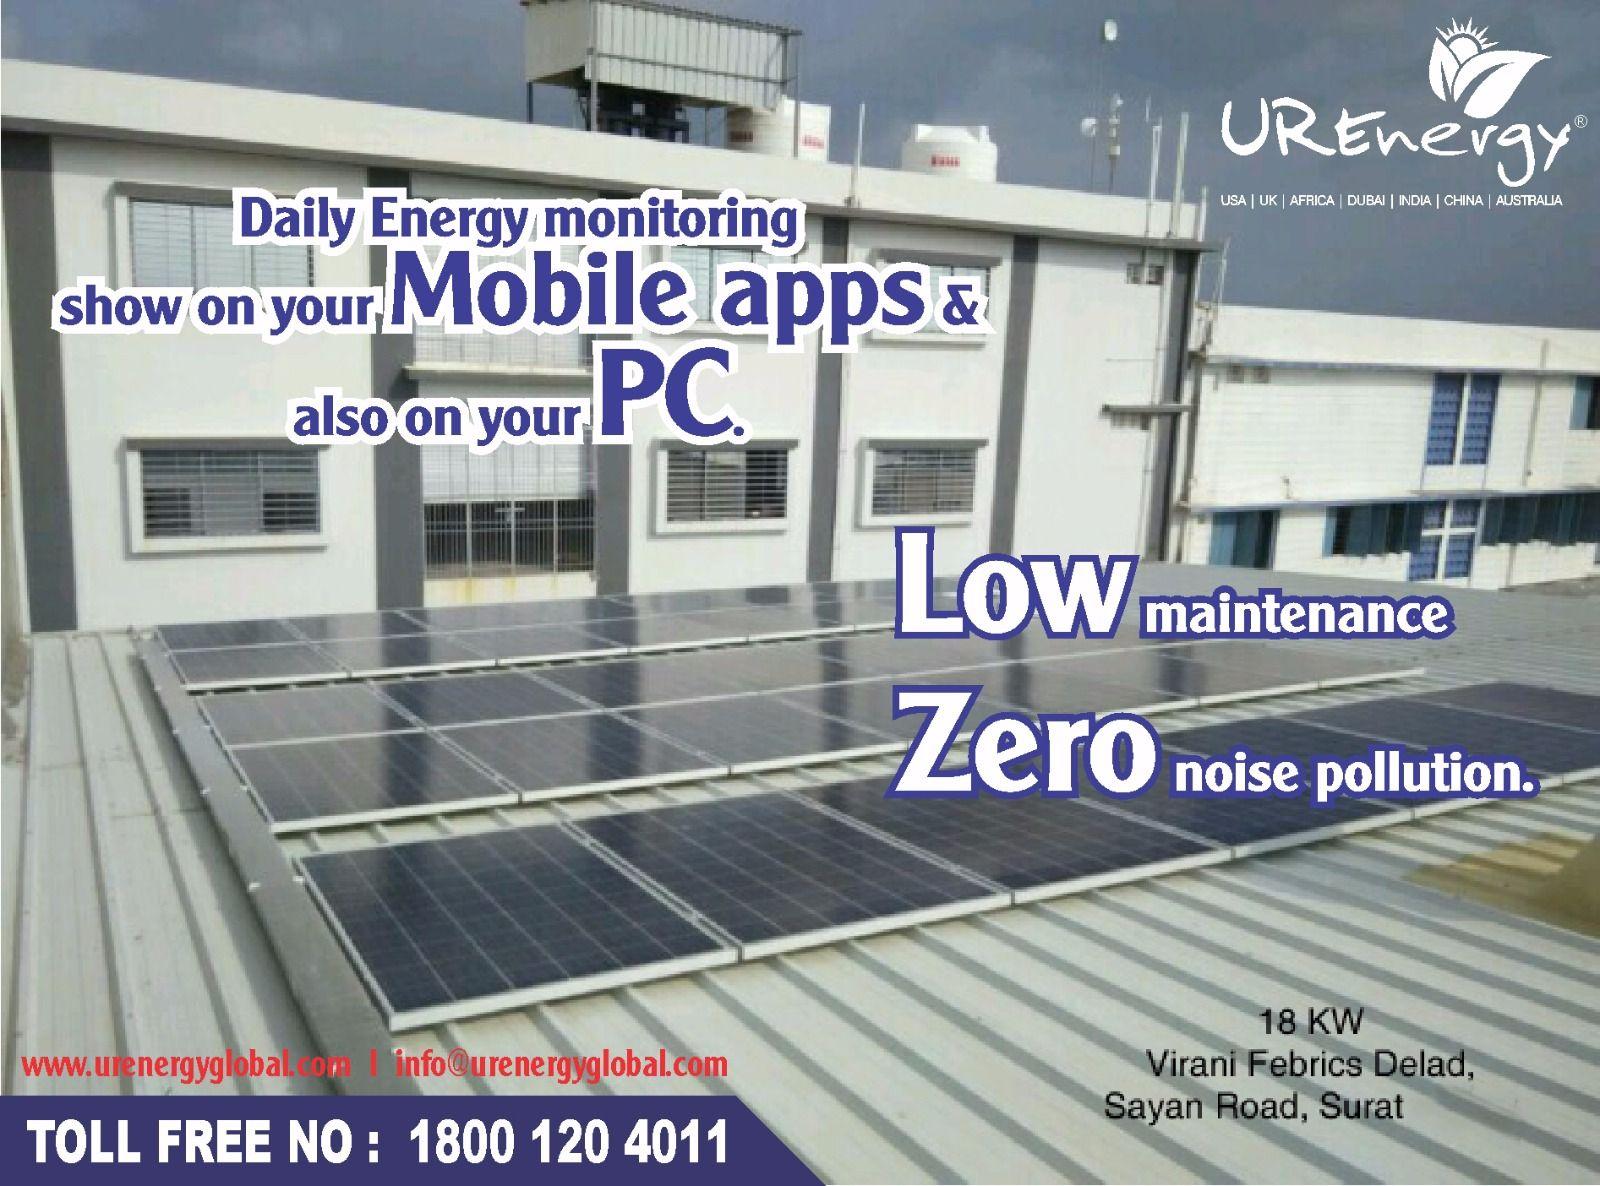 Virani Febrics Delad Sayan Road Surat 18kw Solar Projects Solar Noise Pollution